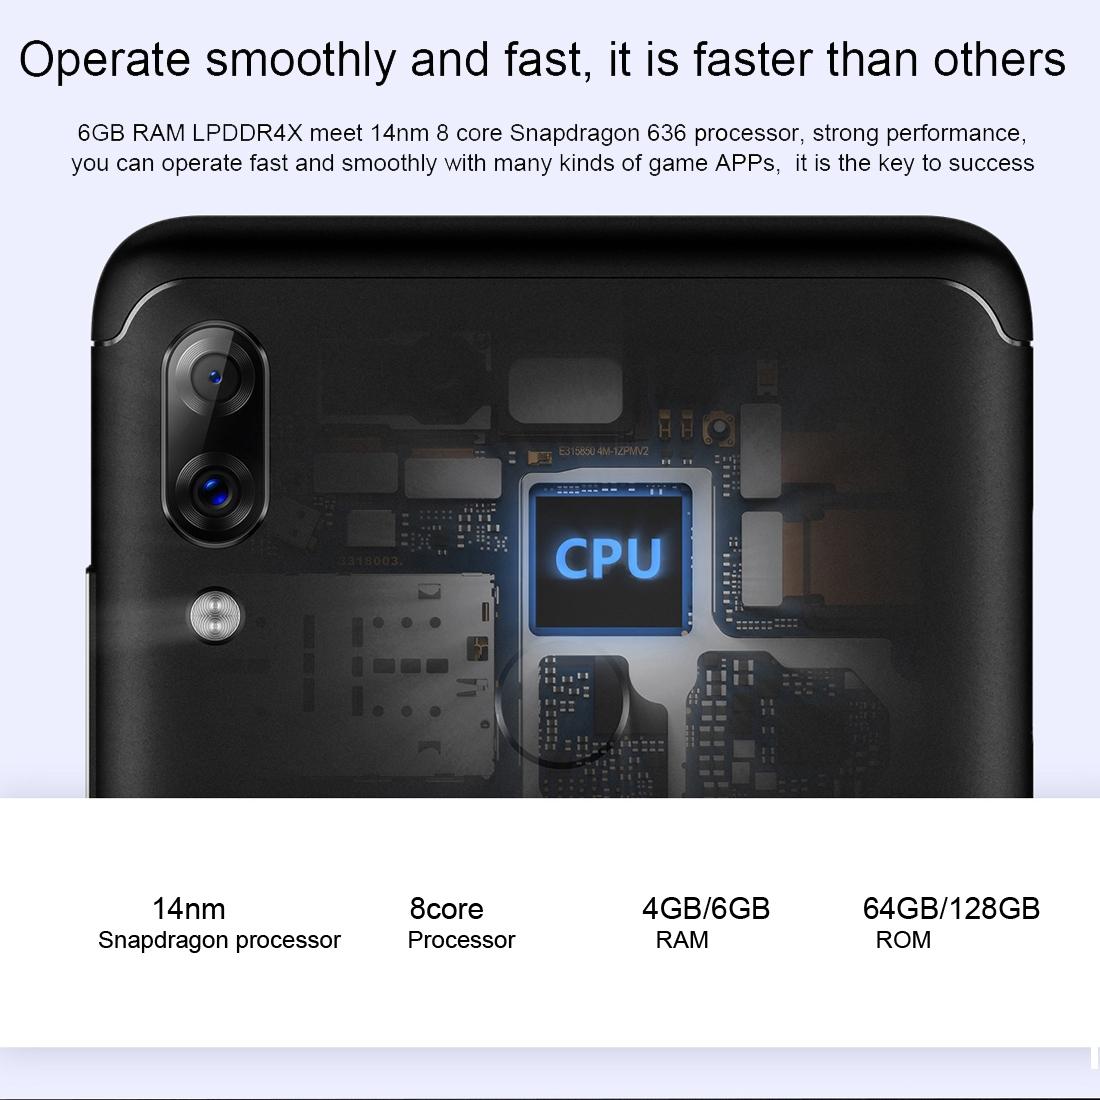 i.ibb.co/wR6FbP4/Smartphone-6-GB-64-GB-Lenovo-K5-Pro-Preto-15.jpg